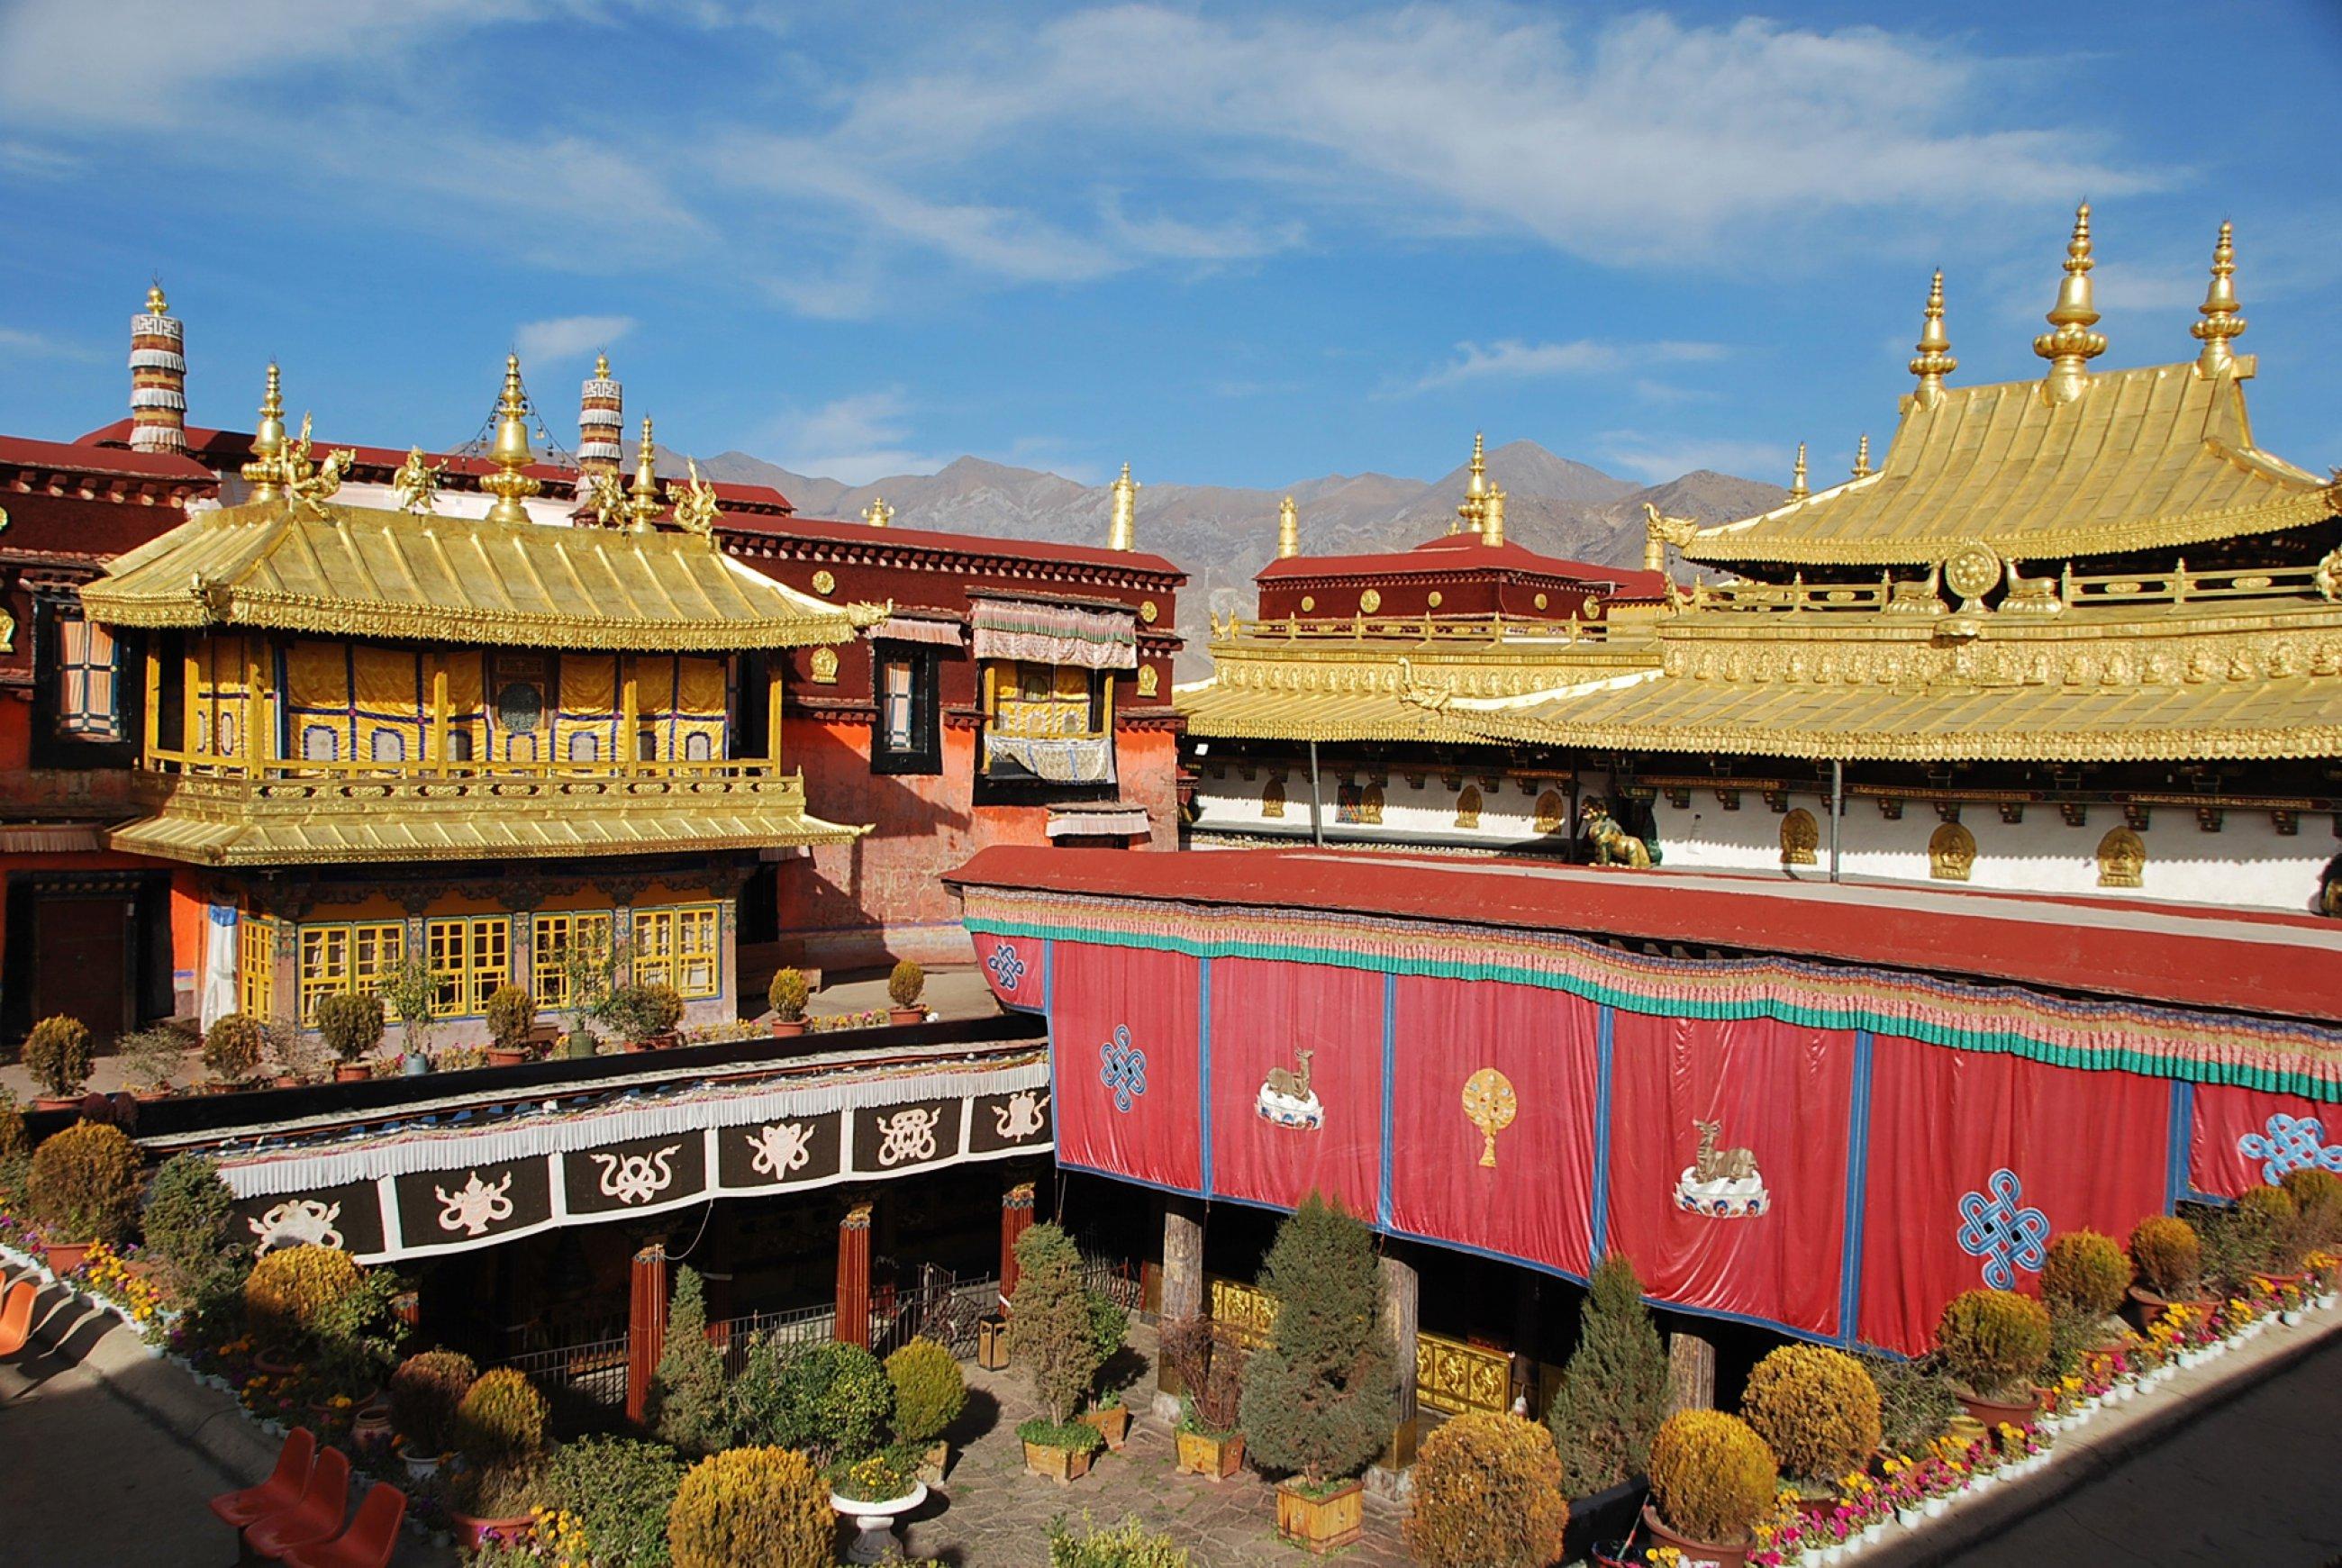 https://bubo.sk/uploads/galleries/16317/tibet-lhasa-ctni-11-2014-mirka-sulka-128-.jpg